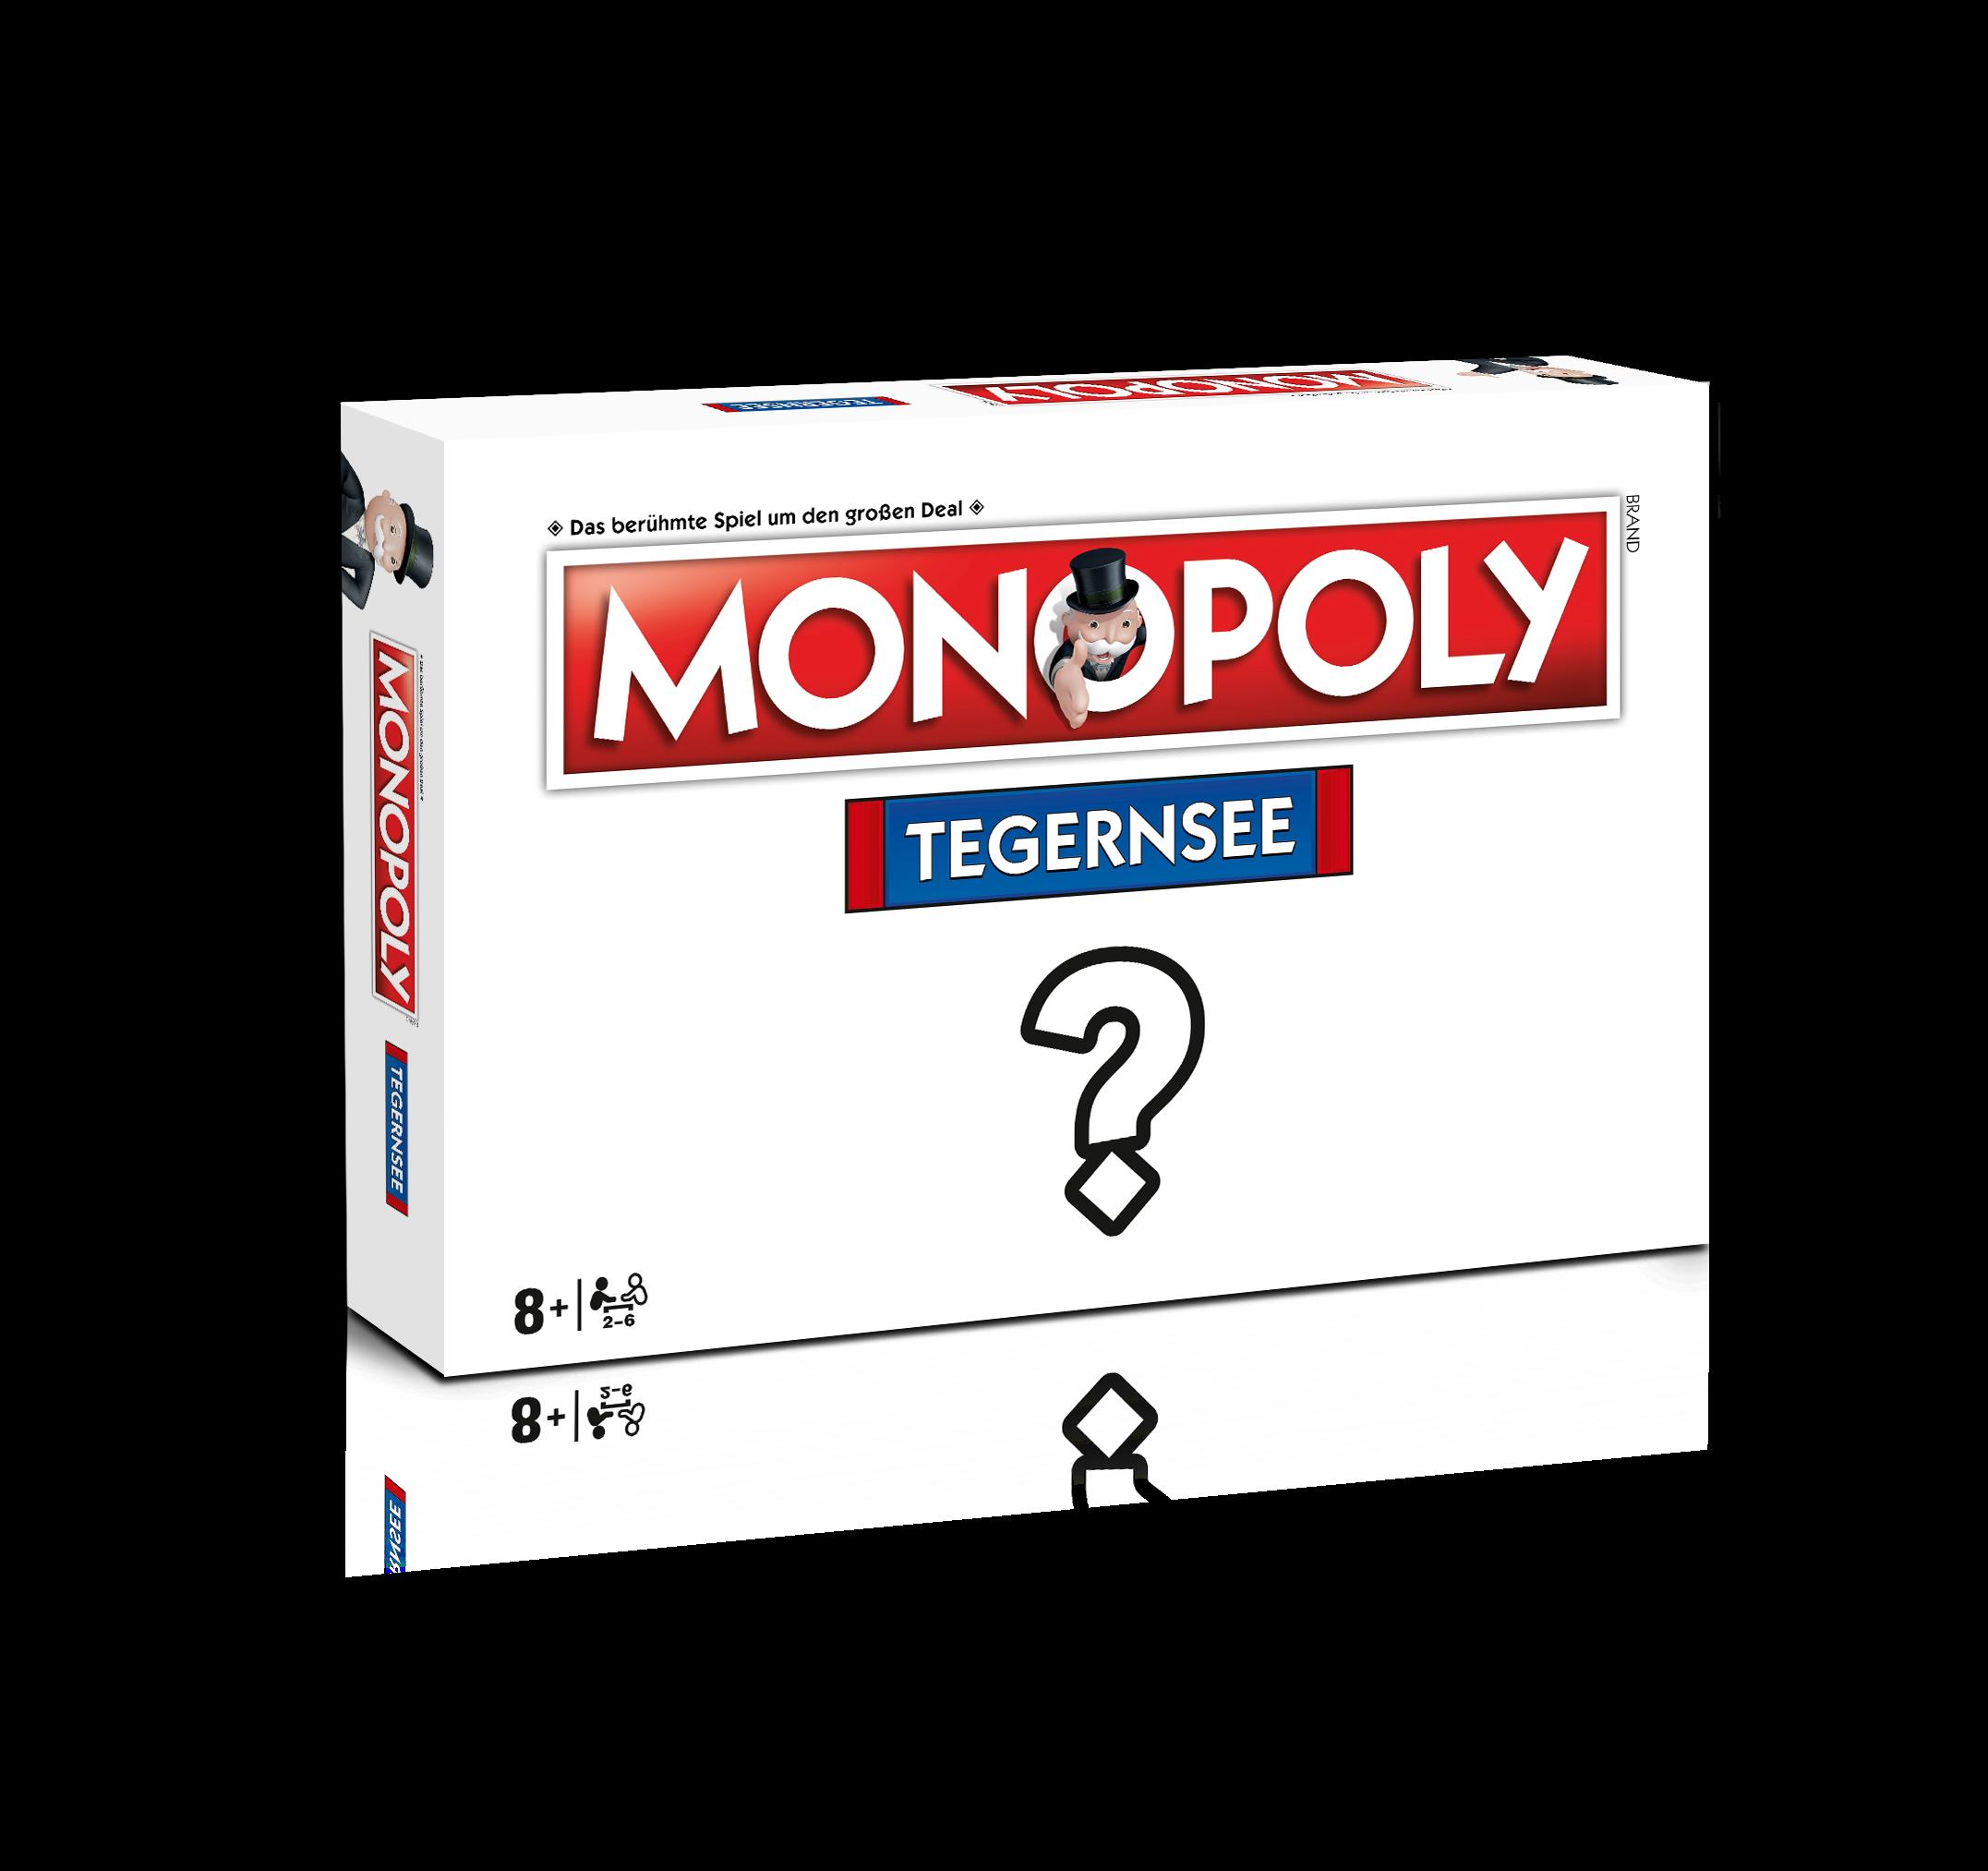 Monopoly Tegernsee